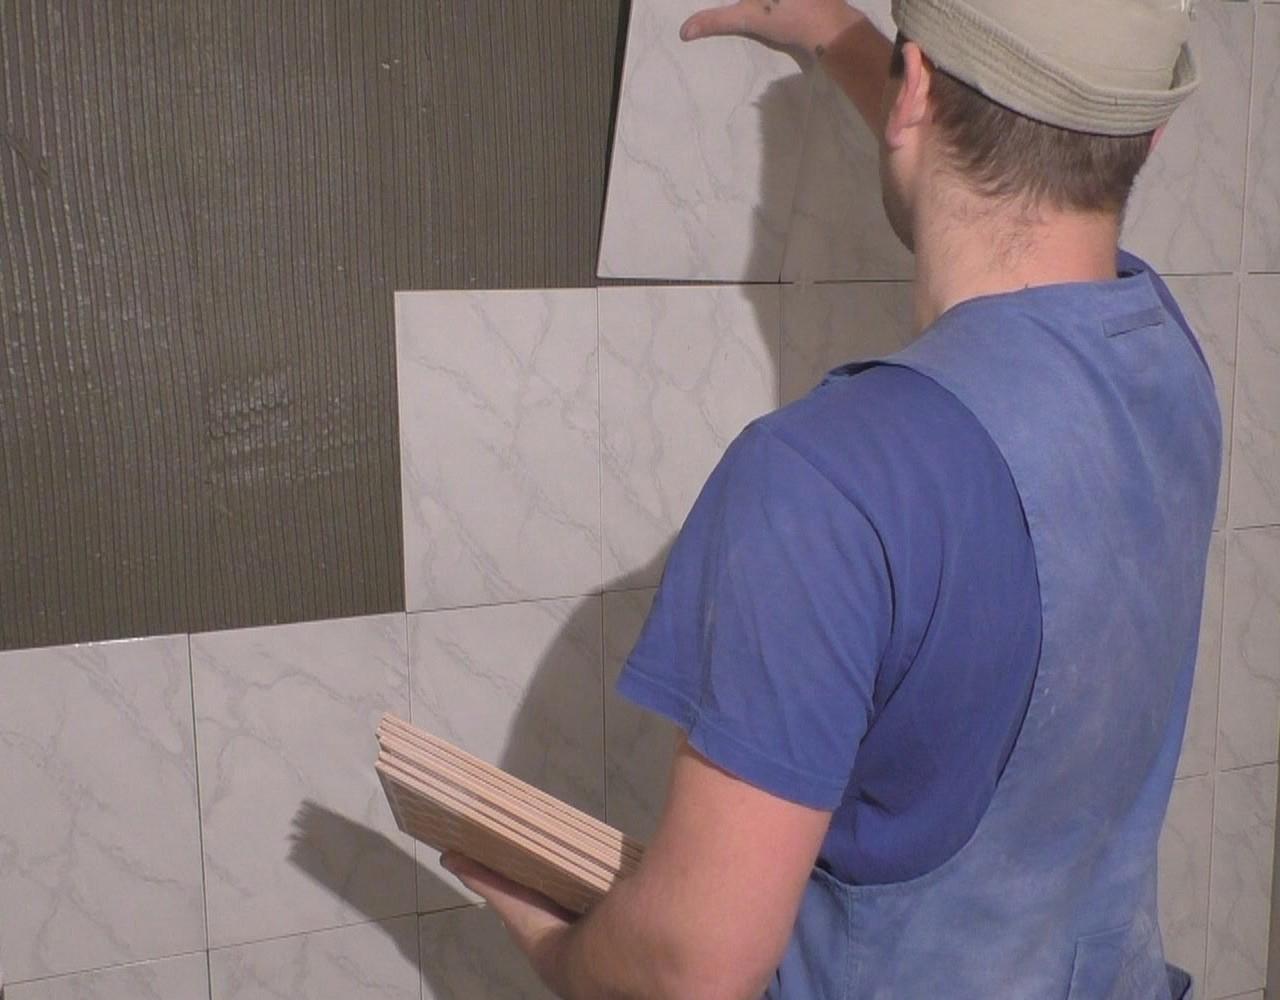 армирующая сетка под плитку